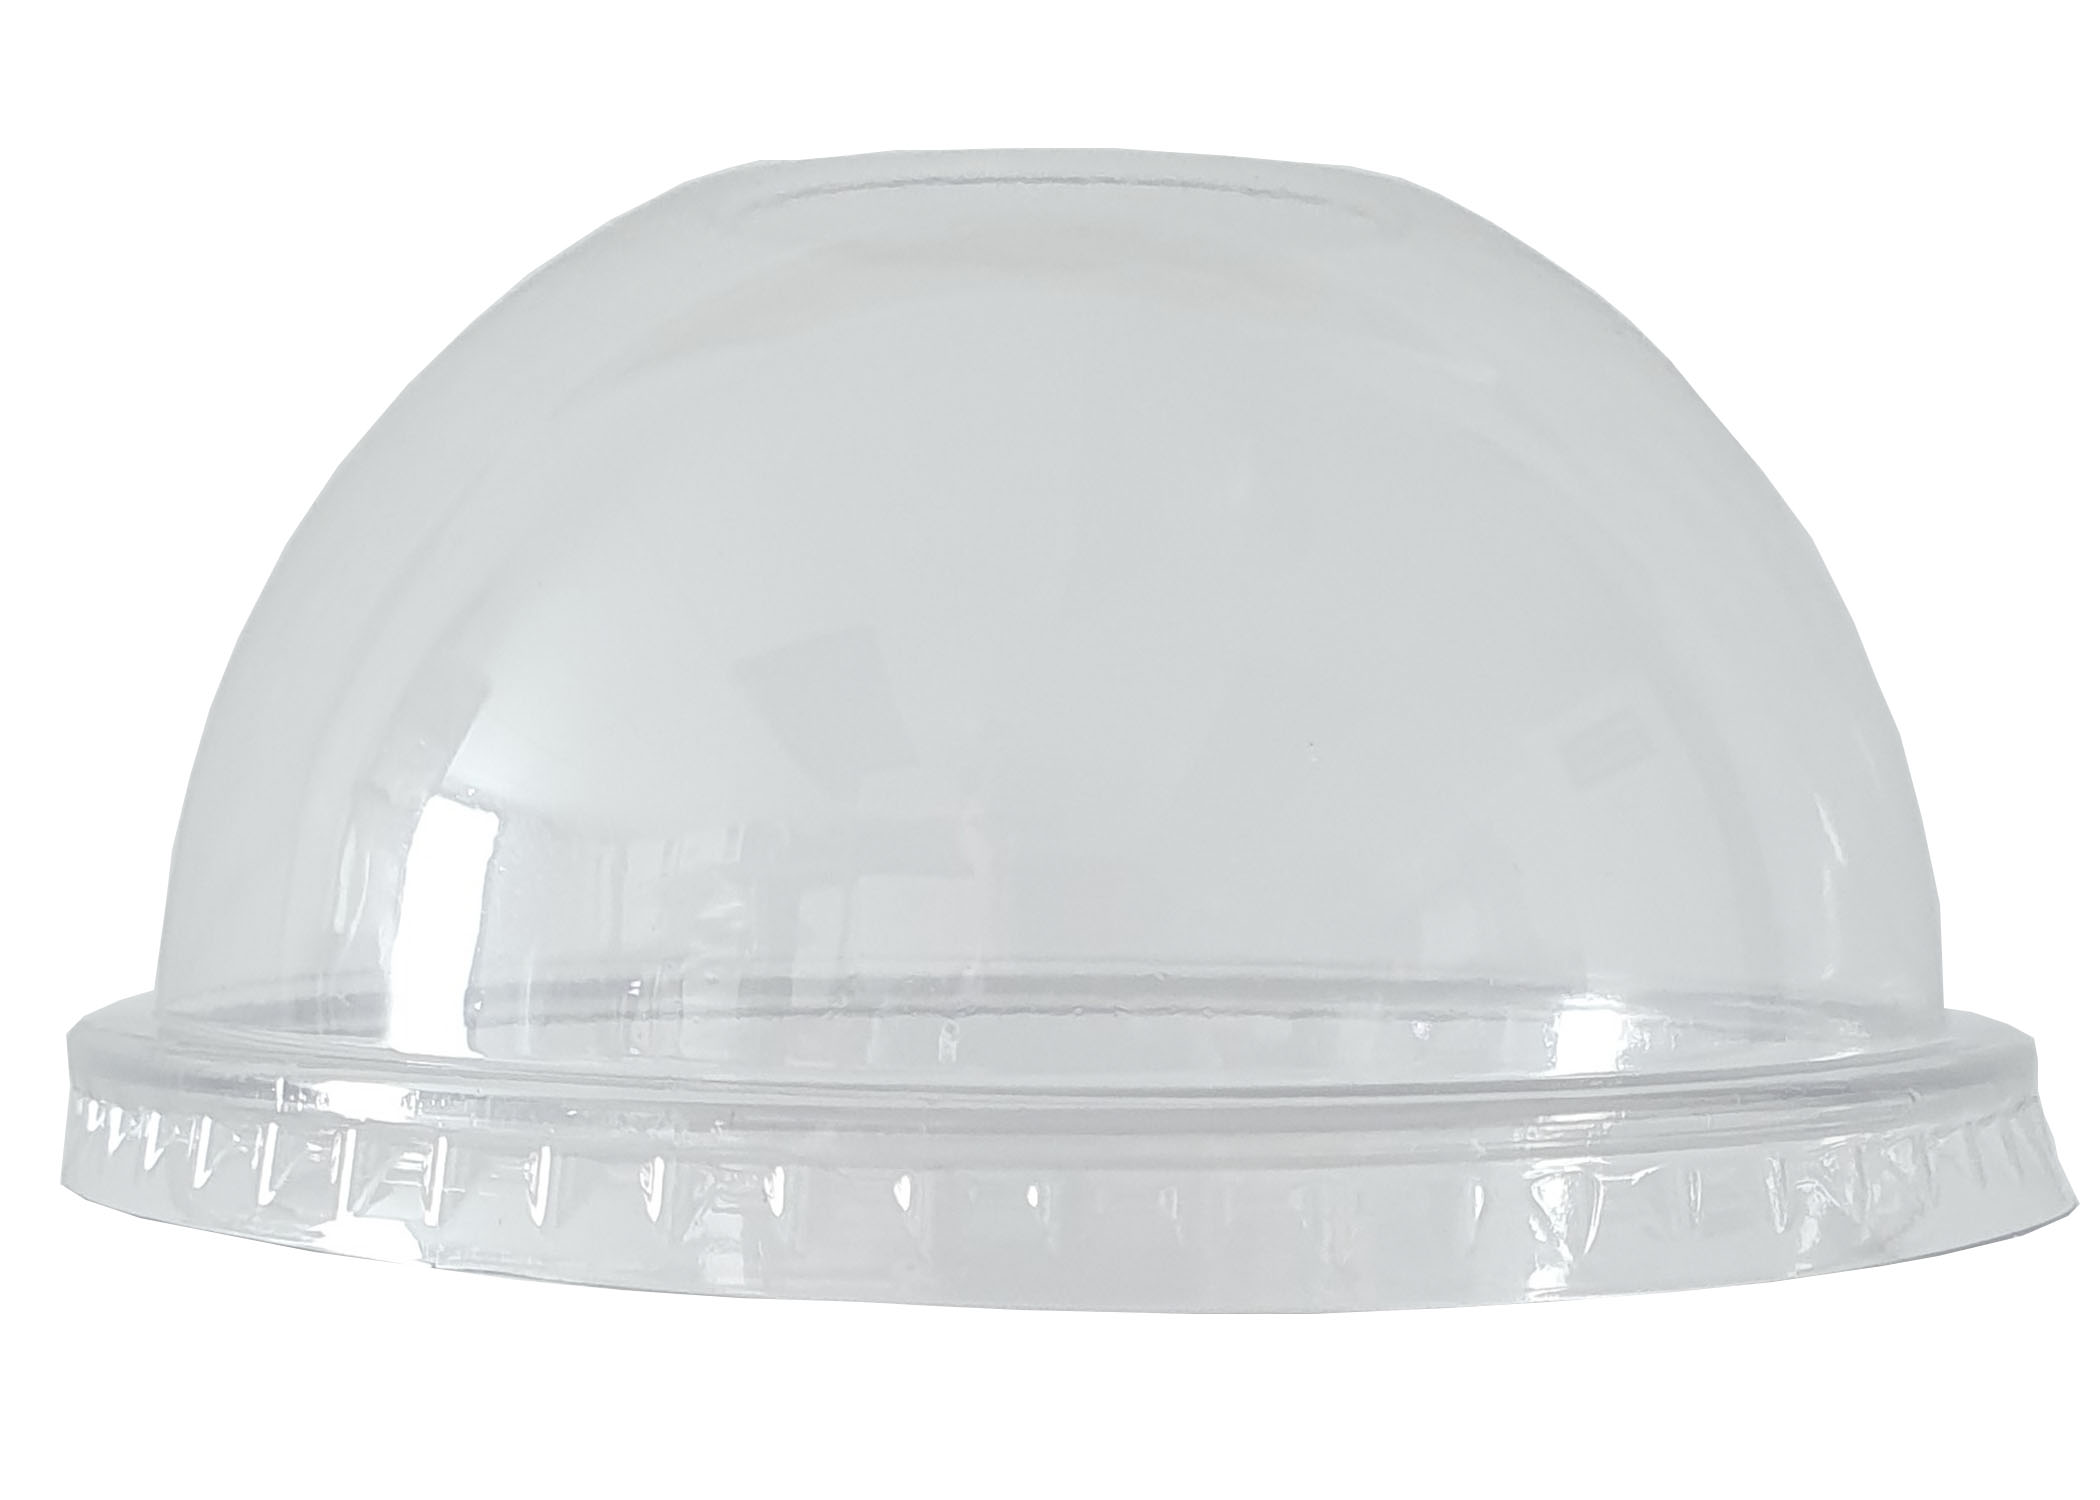 Tapa cúpula cerrada D95